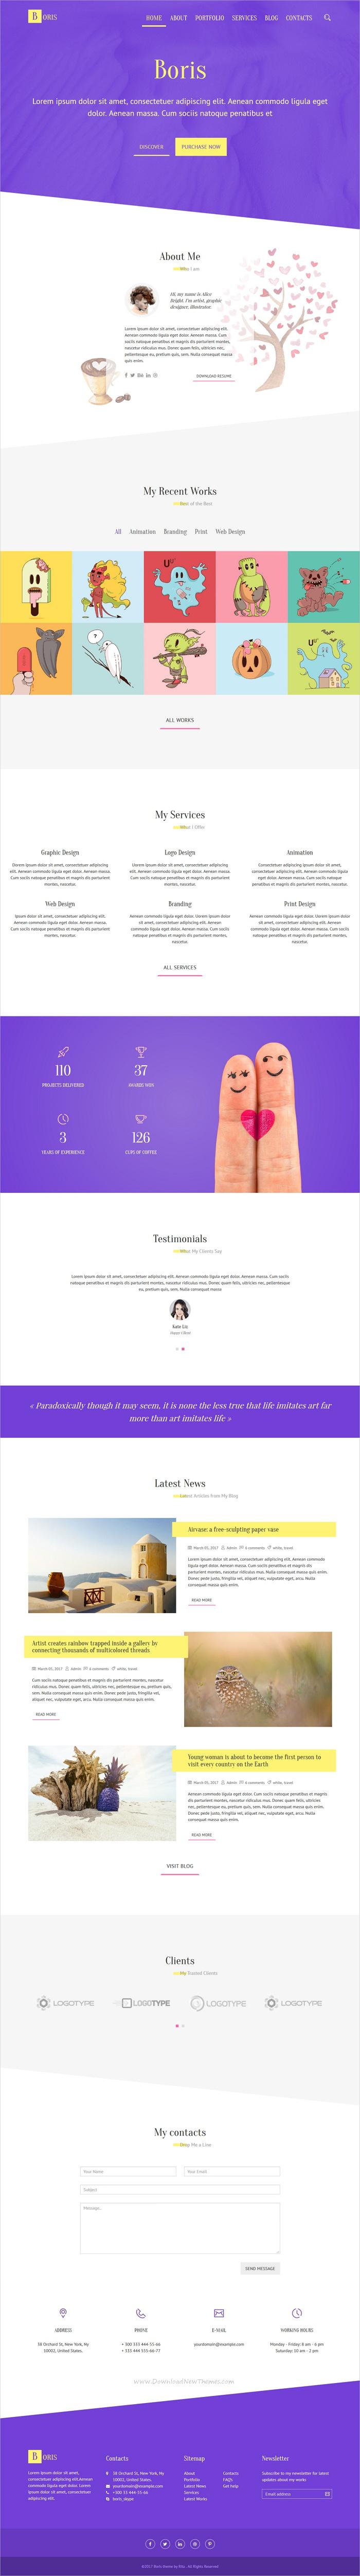 Boris Creative Portfolio HTML Template (With images